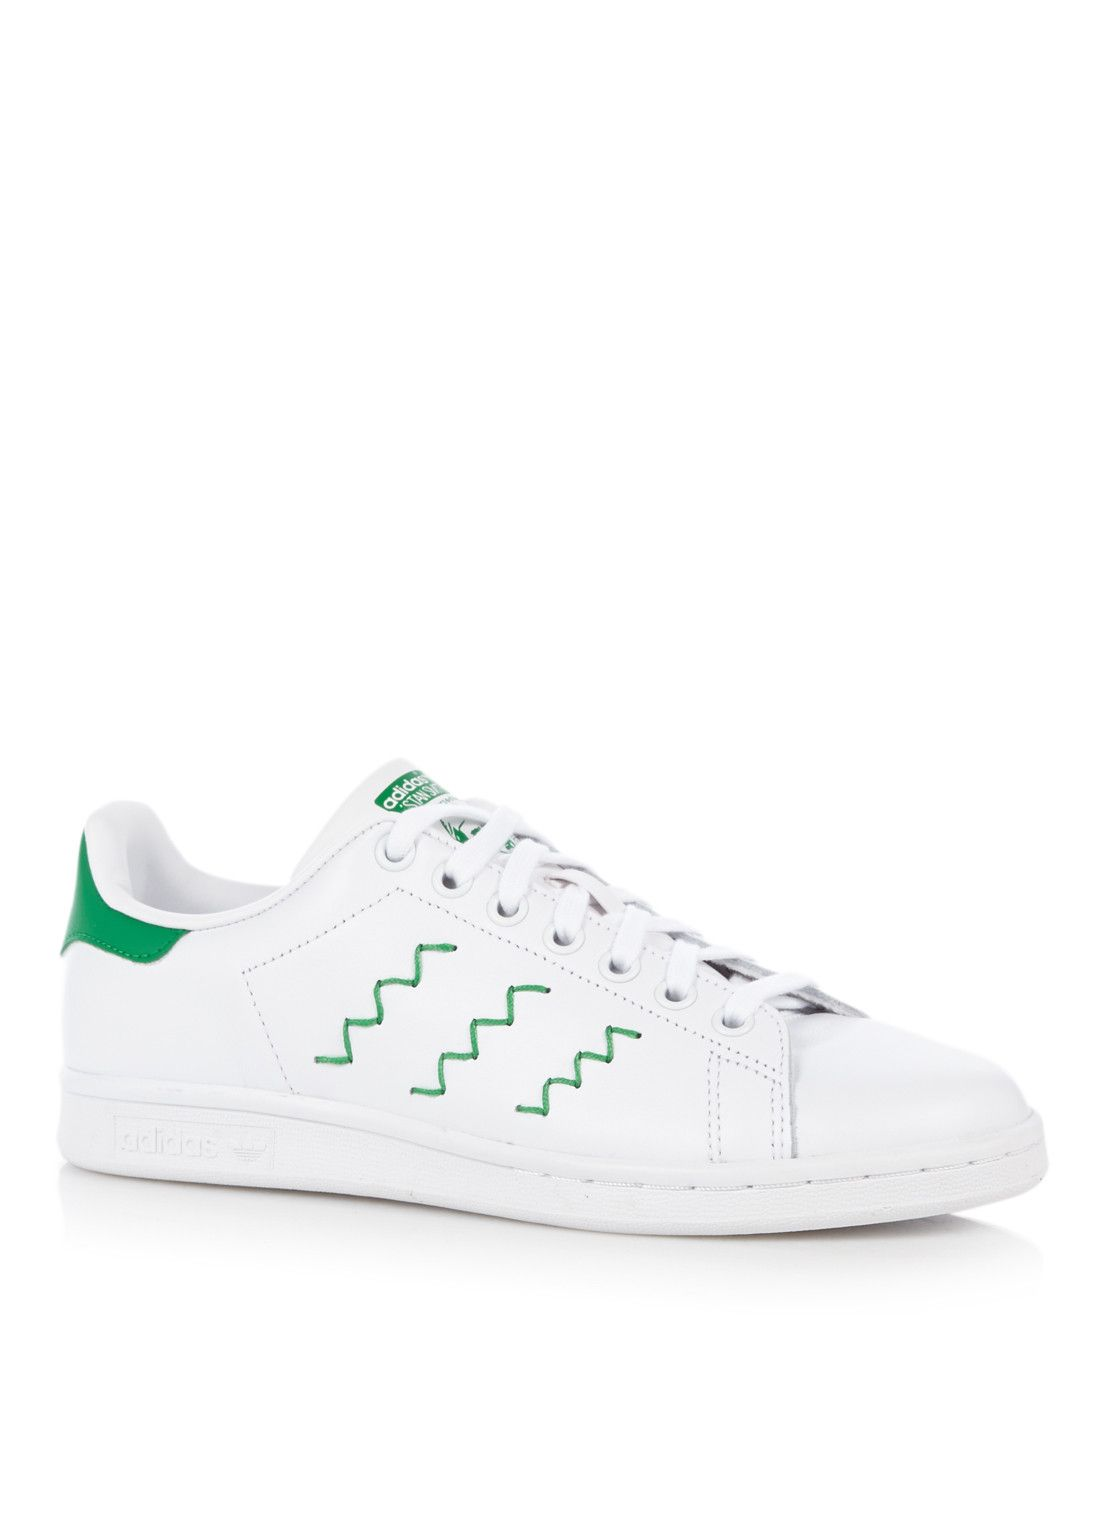 adidas stan smith zigzag groen